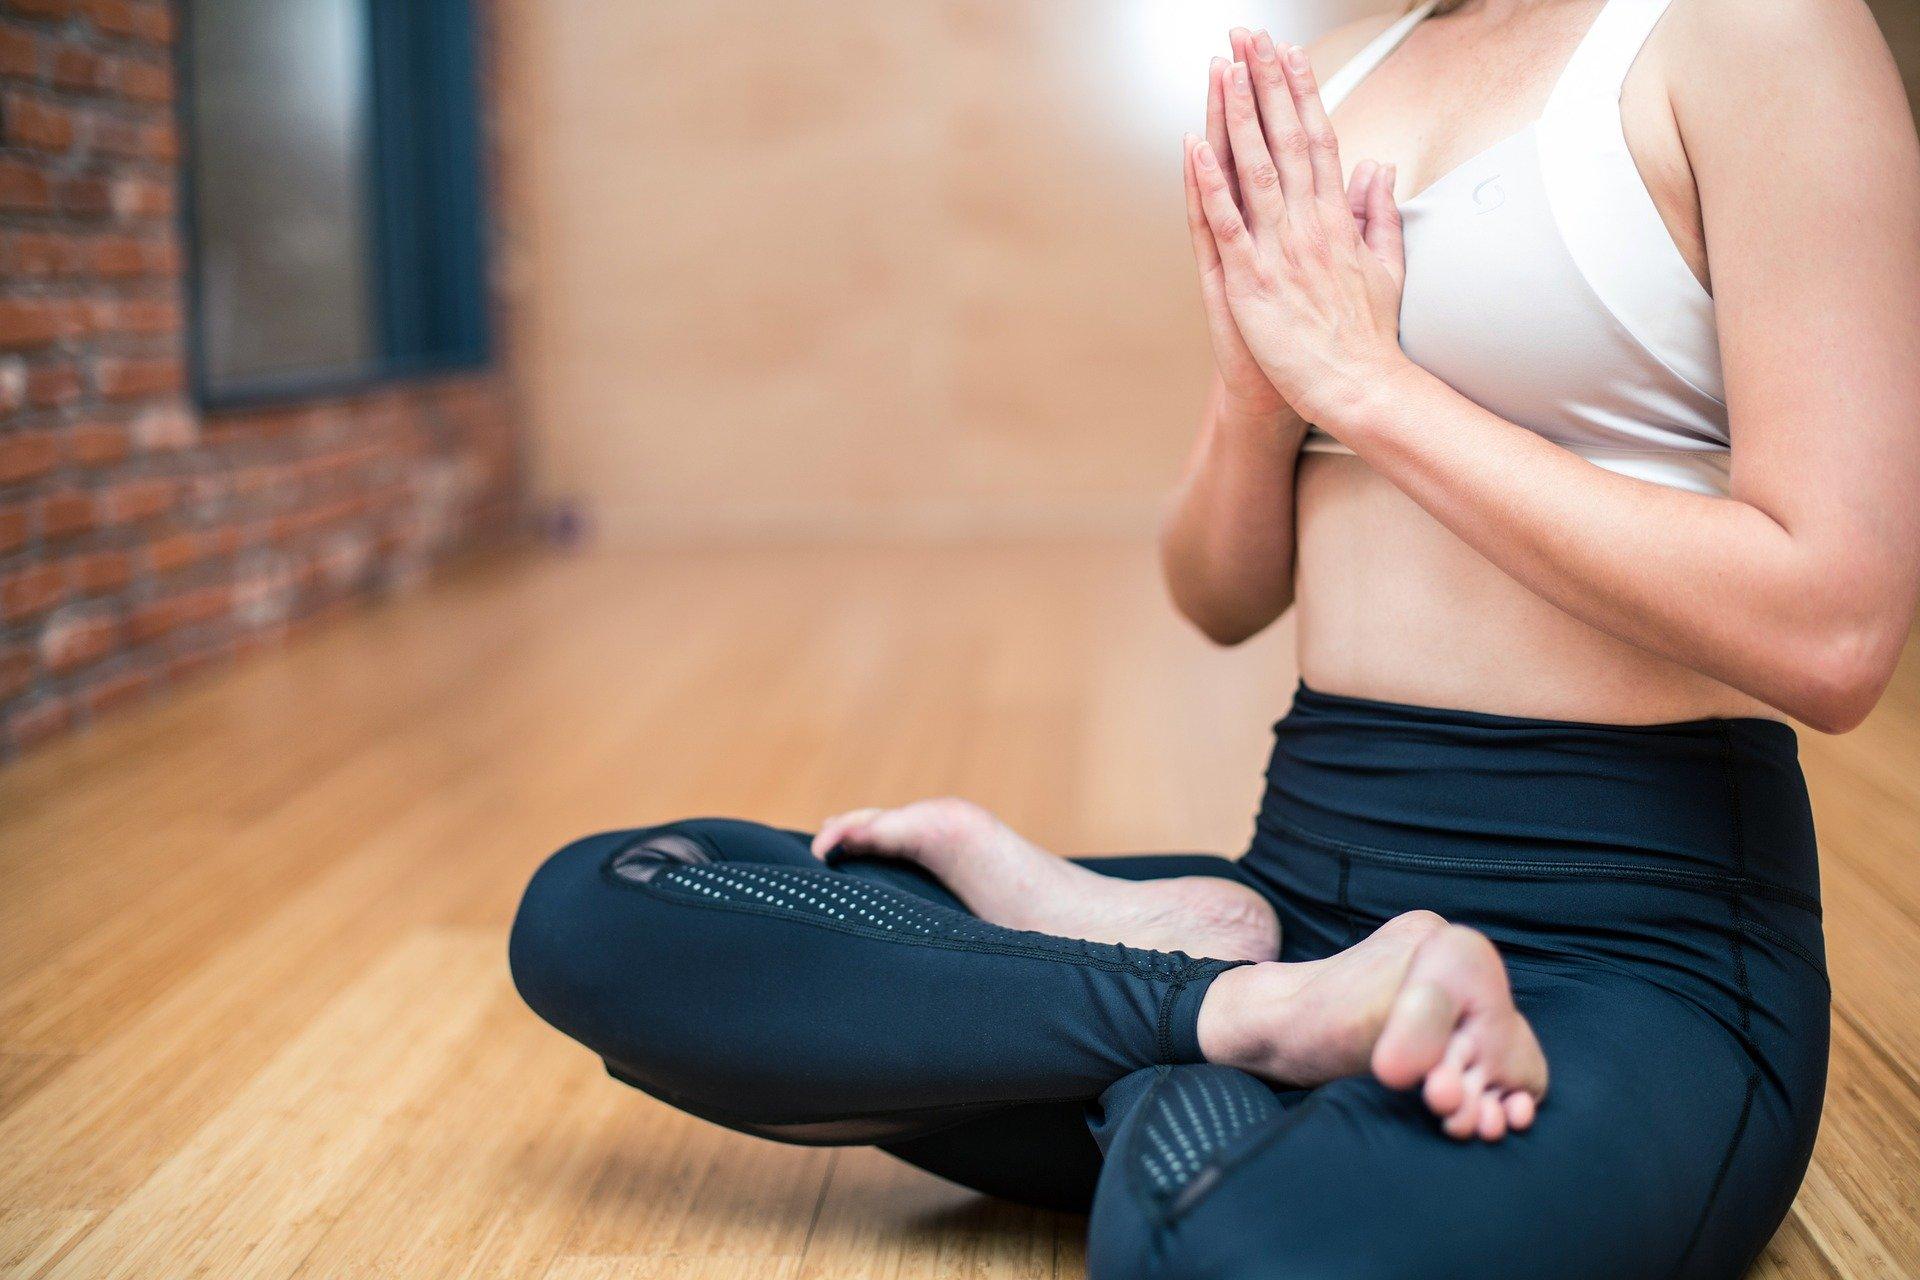 Fr, 14.02., 19.30 Uhr: Yoga im Pestalozzi-Treff (Pestalozzistraße 1a) © Irina L, Pixabay